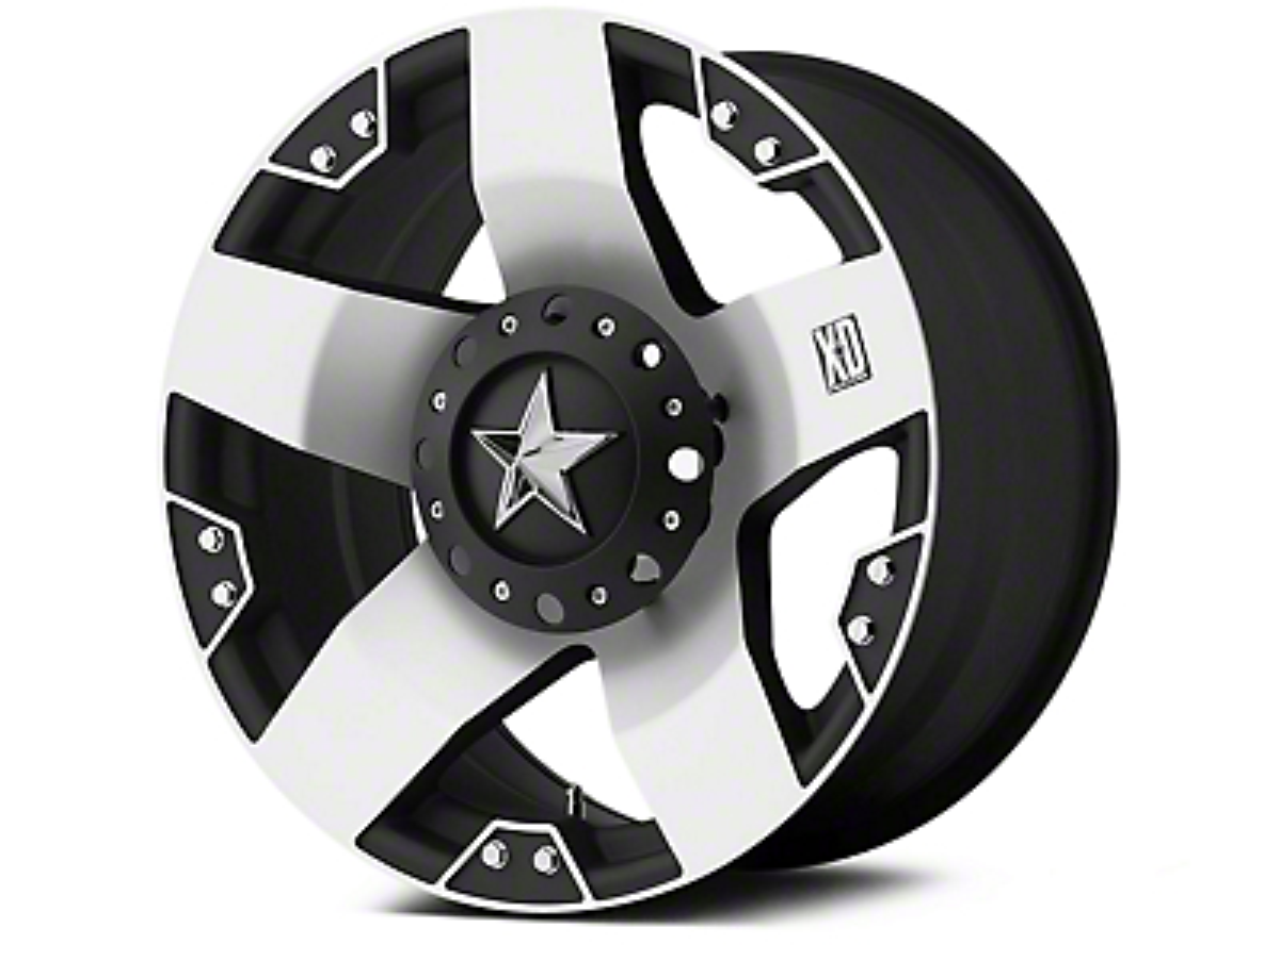 Rockstar XD775 Black Machined 5-Lug Wheel - 20x8.5 (02-18 RAM 1500, Excluding Mega Cab)